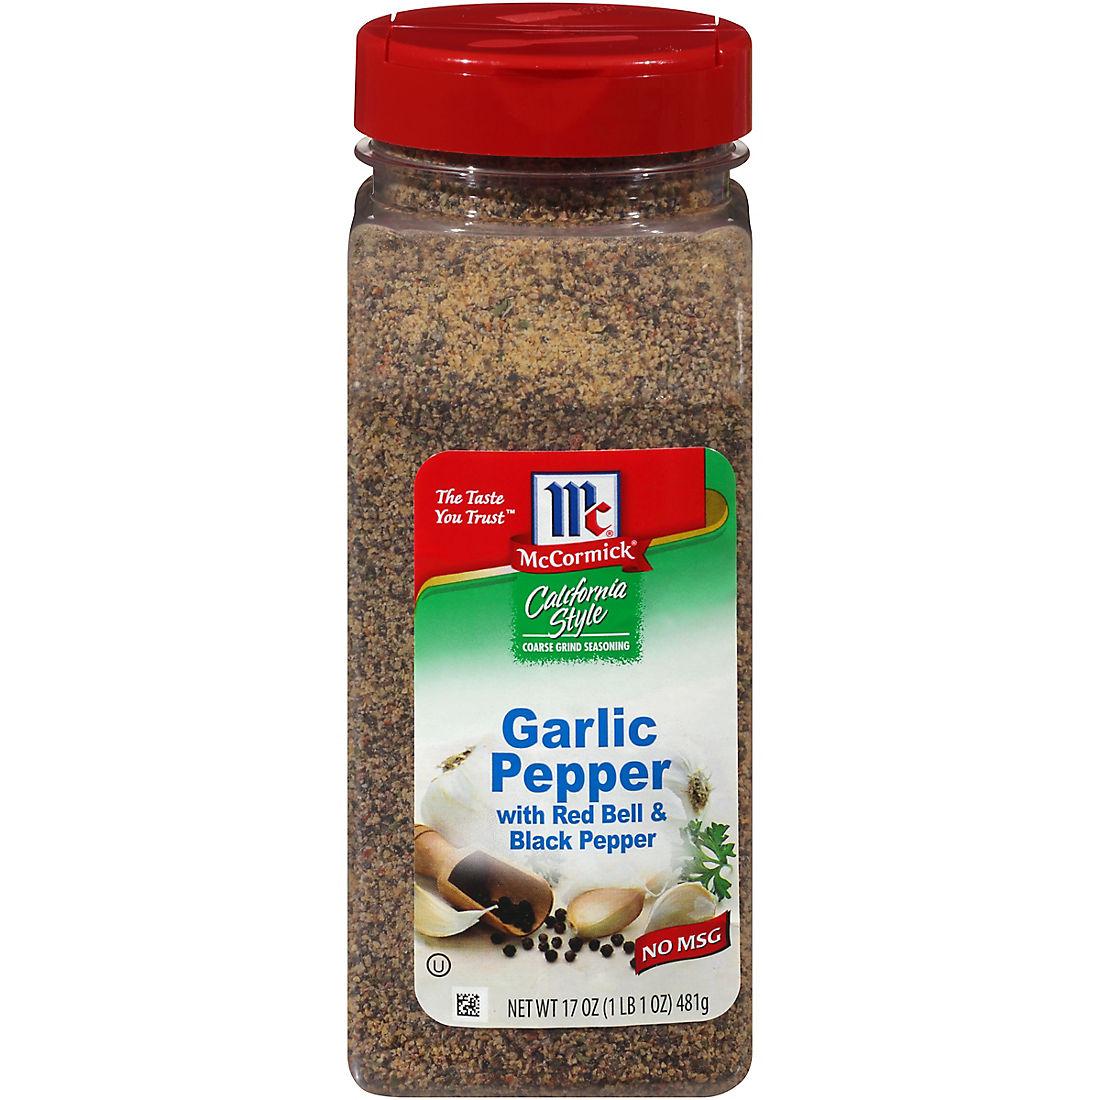 McCormick California Style Garlic Pepper, 17 oz